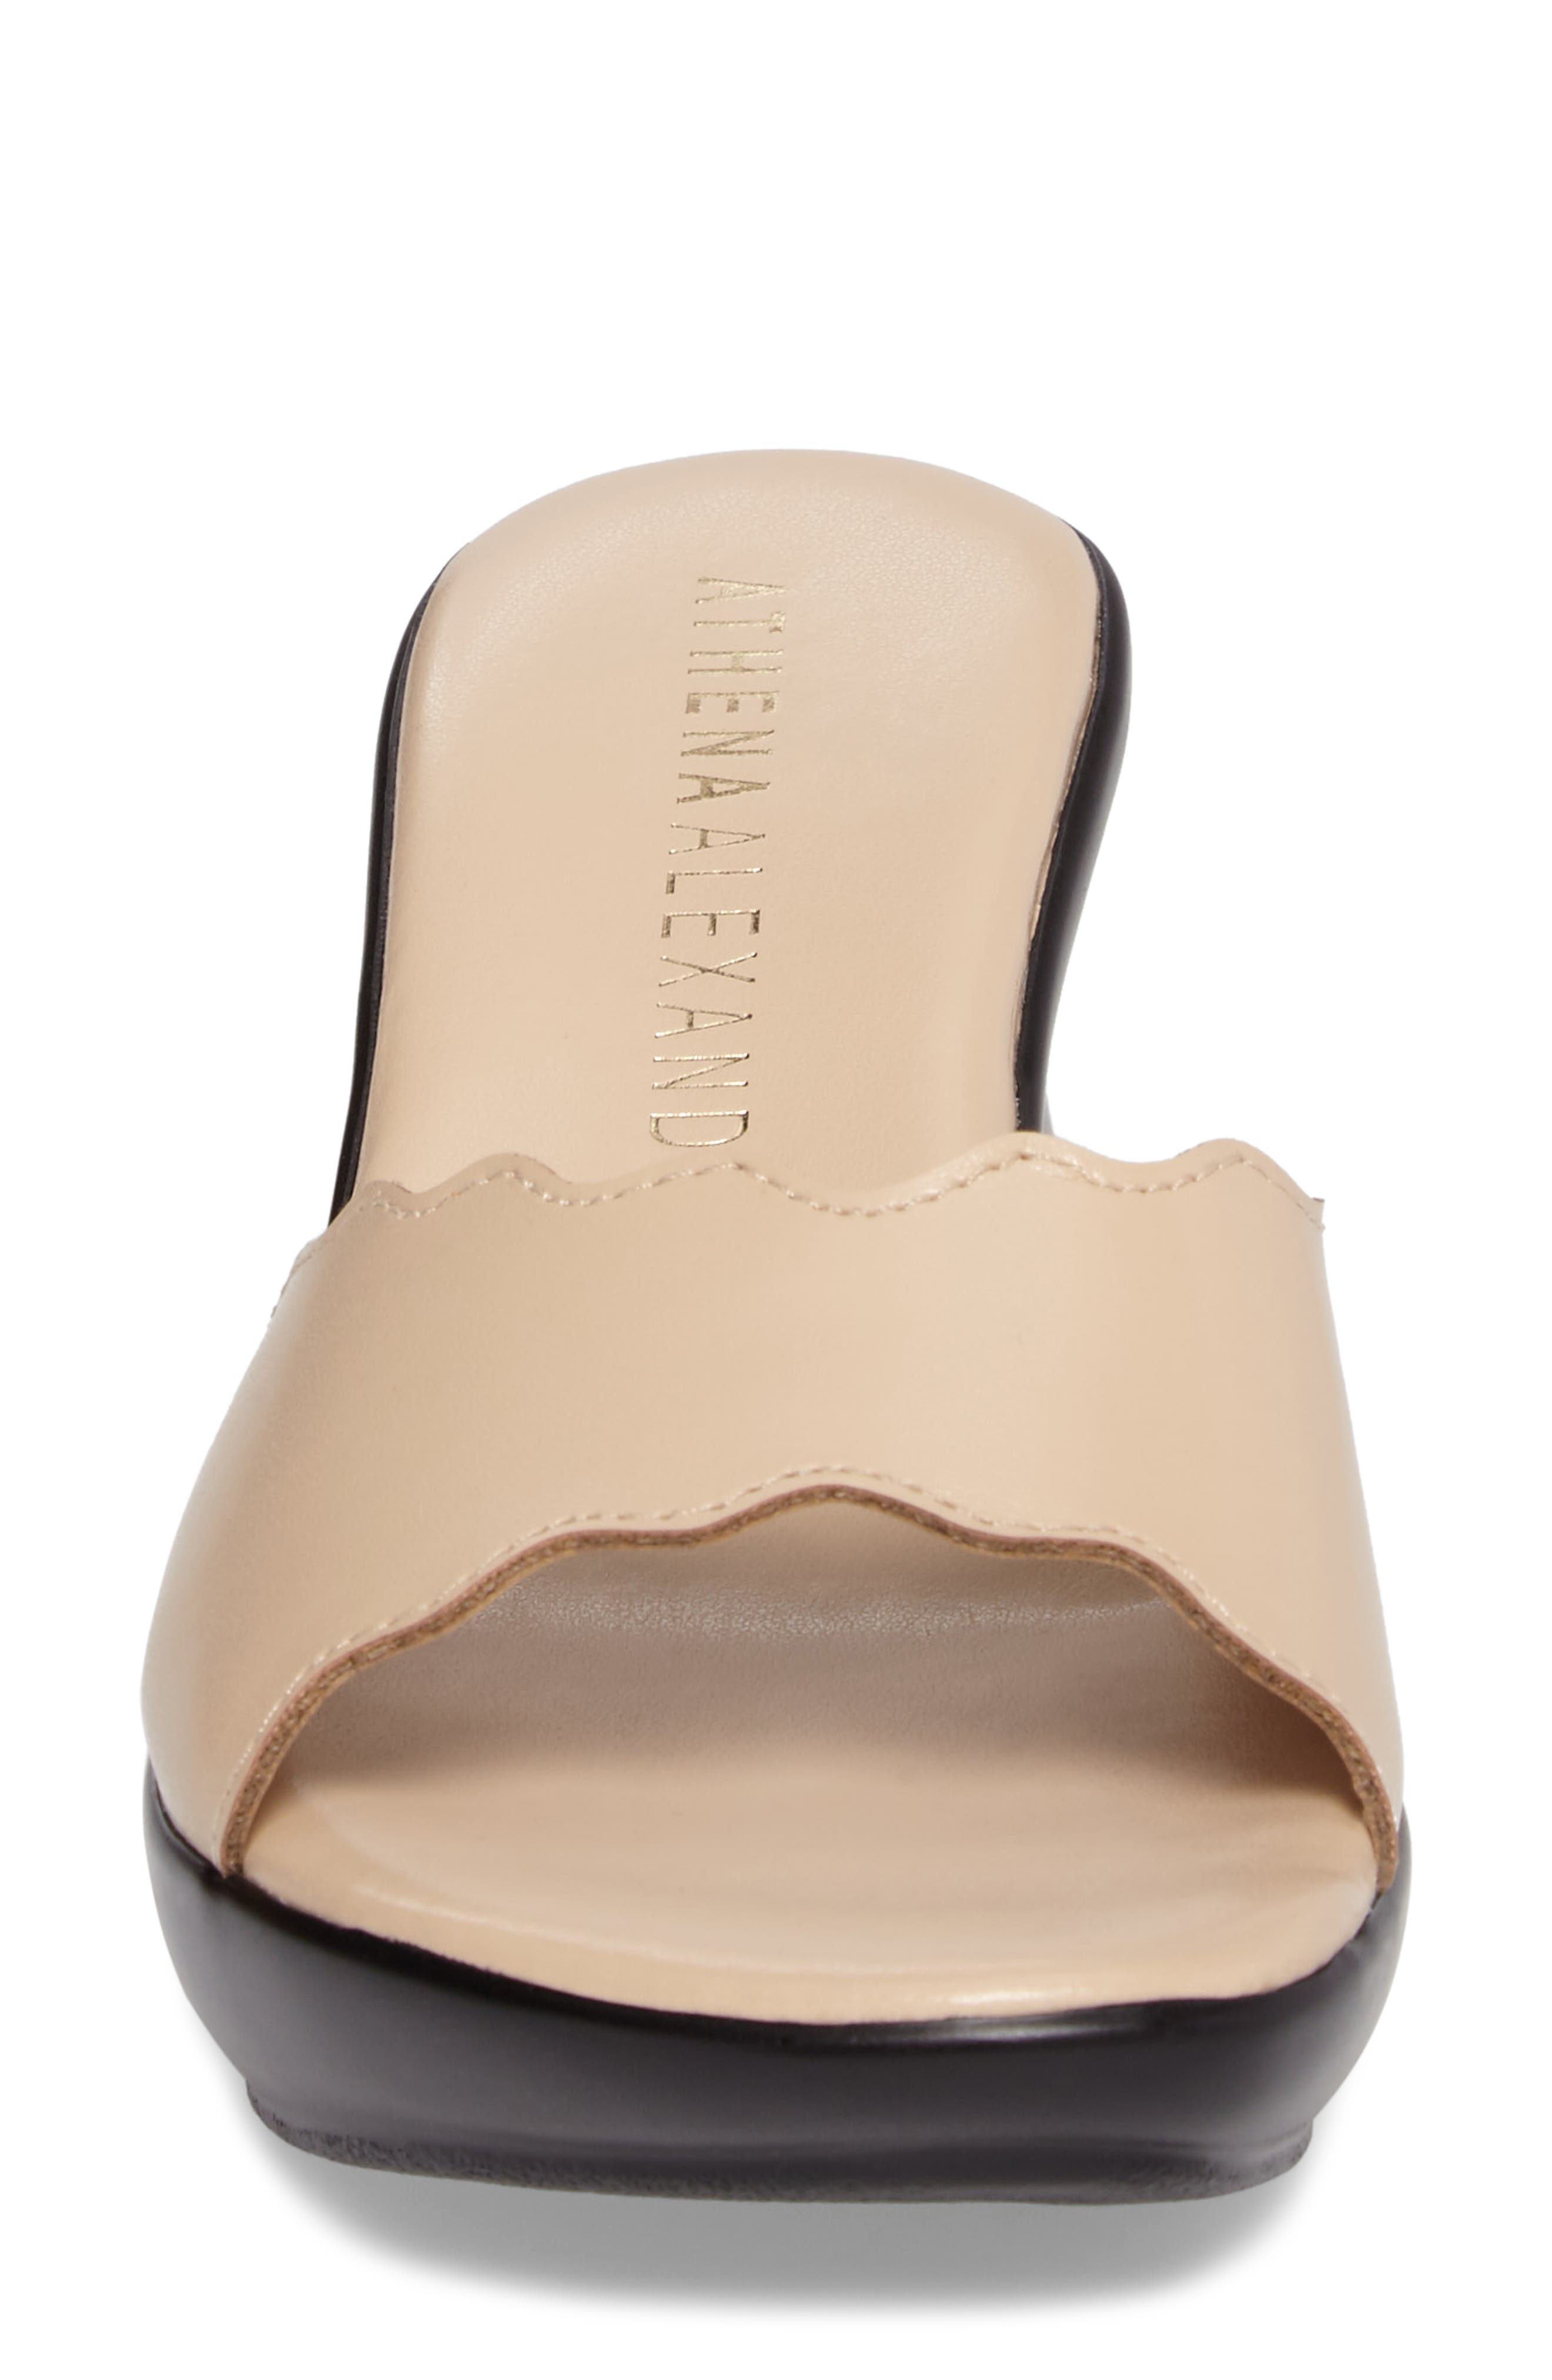 Novva Sandal,                             Alternate thumbnail 4, color,                             Nude Faux Leather